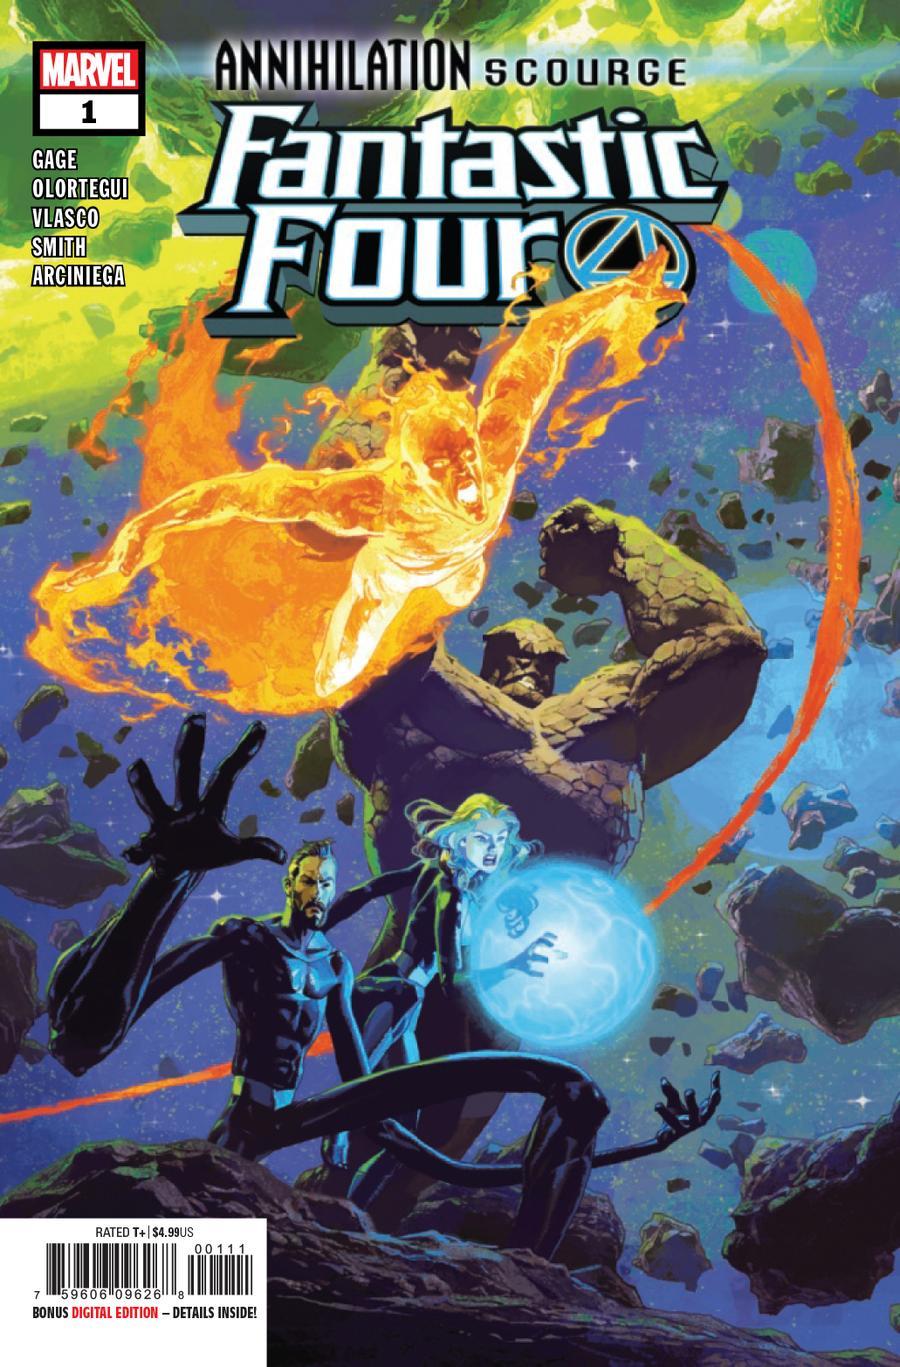 Annihilation Scourge Fantastic Four #1 Cover A Regular Josemaria Casanovas Cover